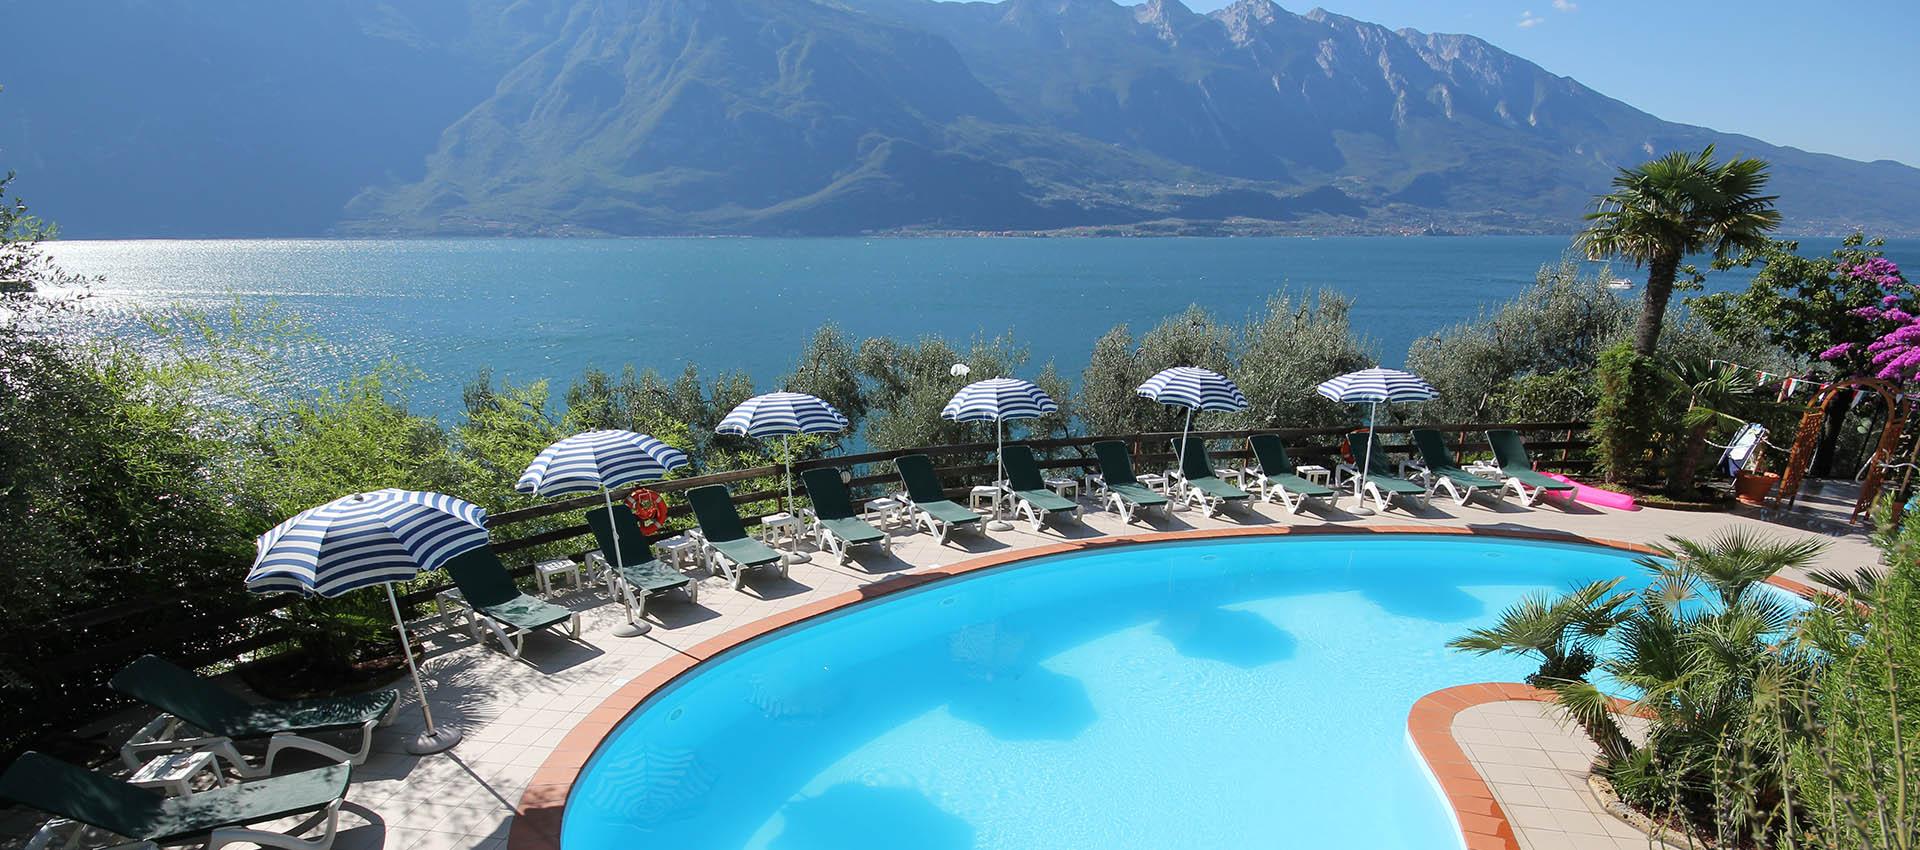 Best Hotels Lake Maggiore